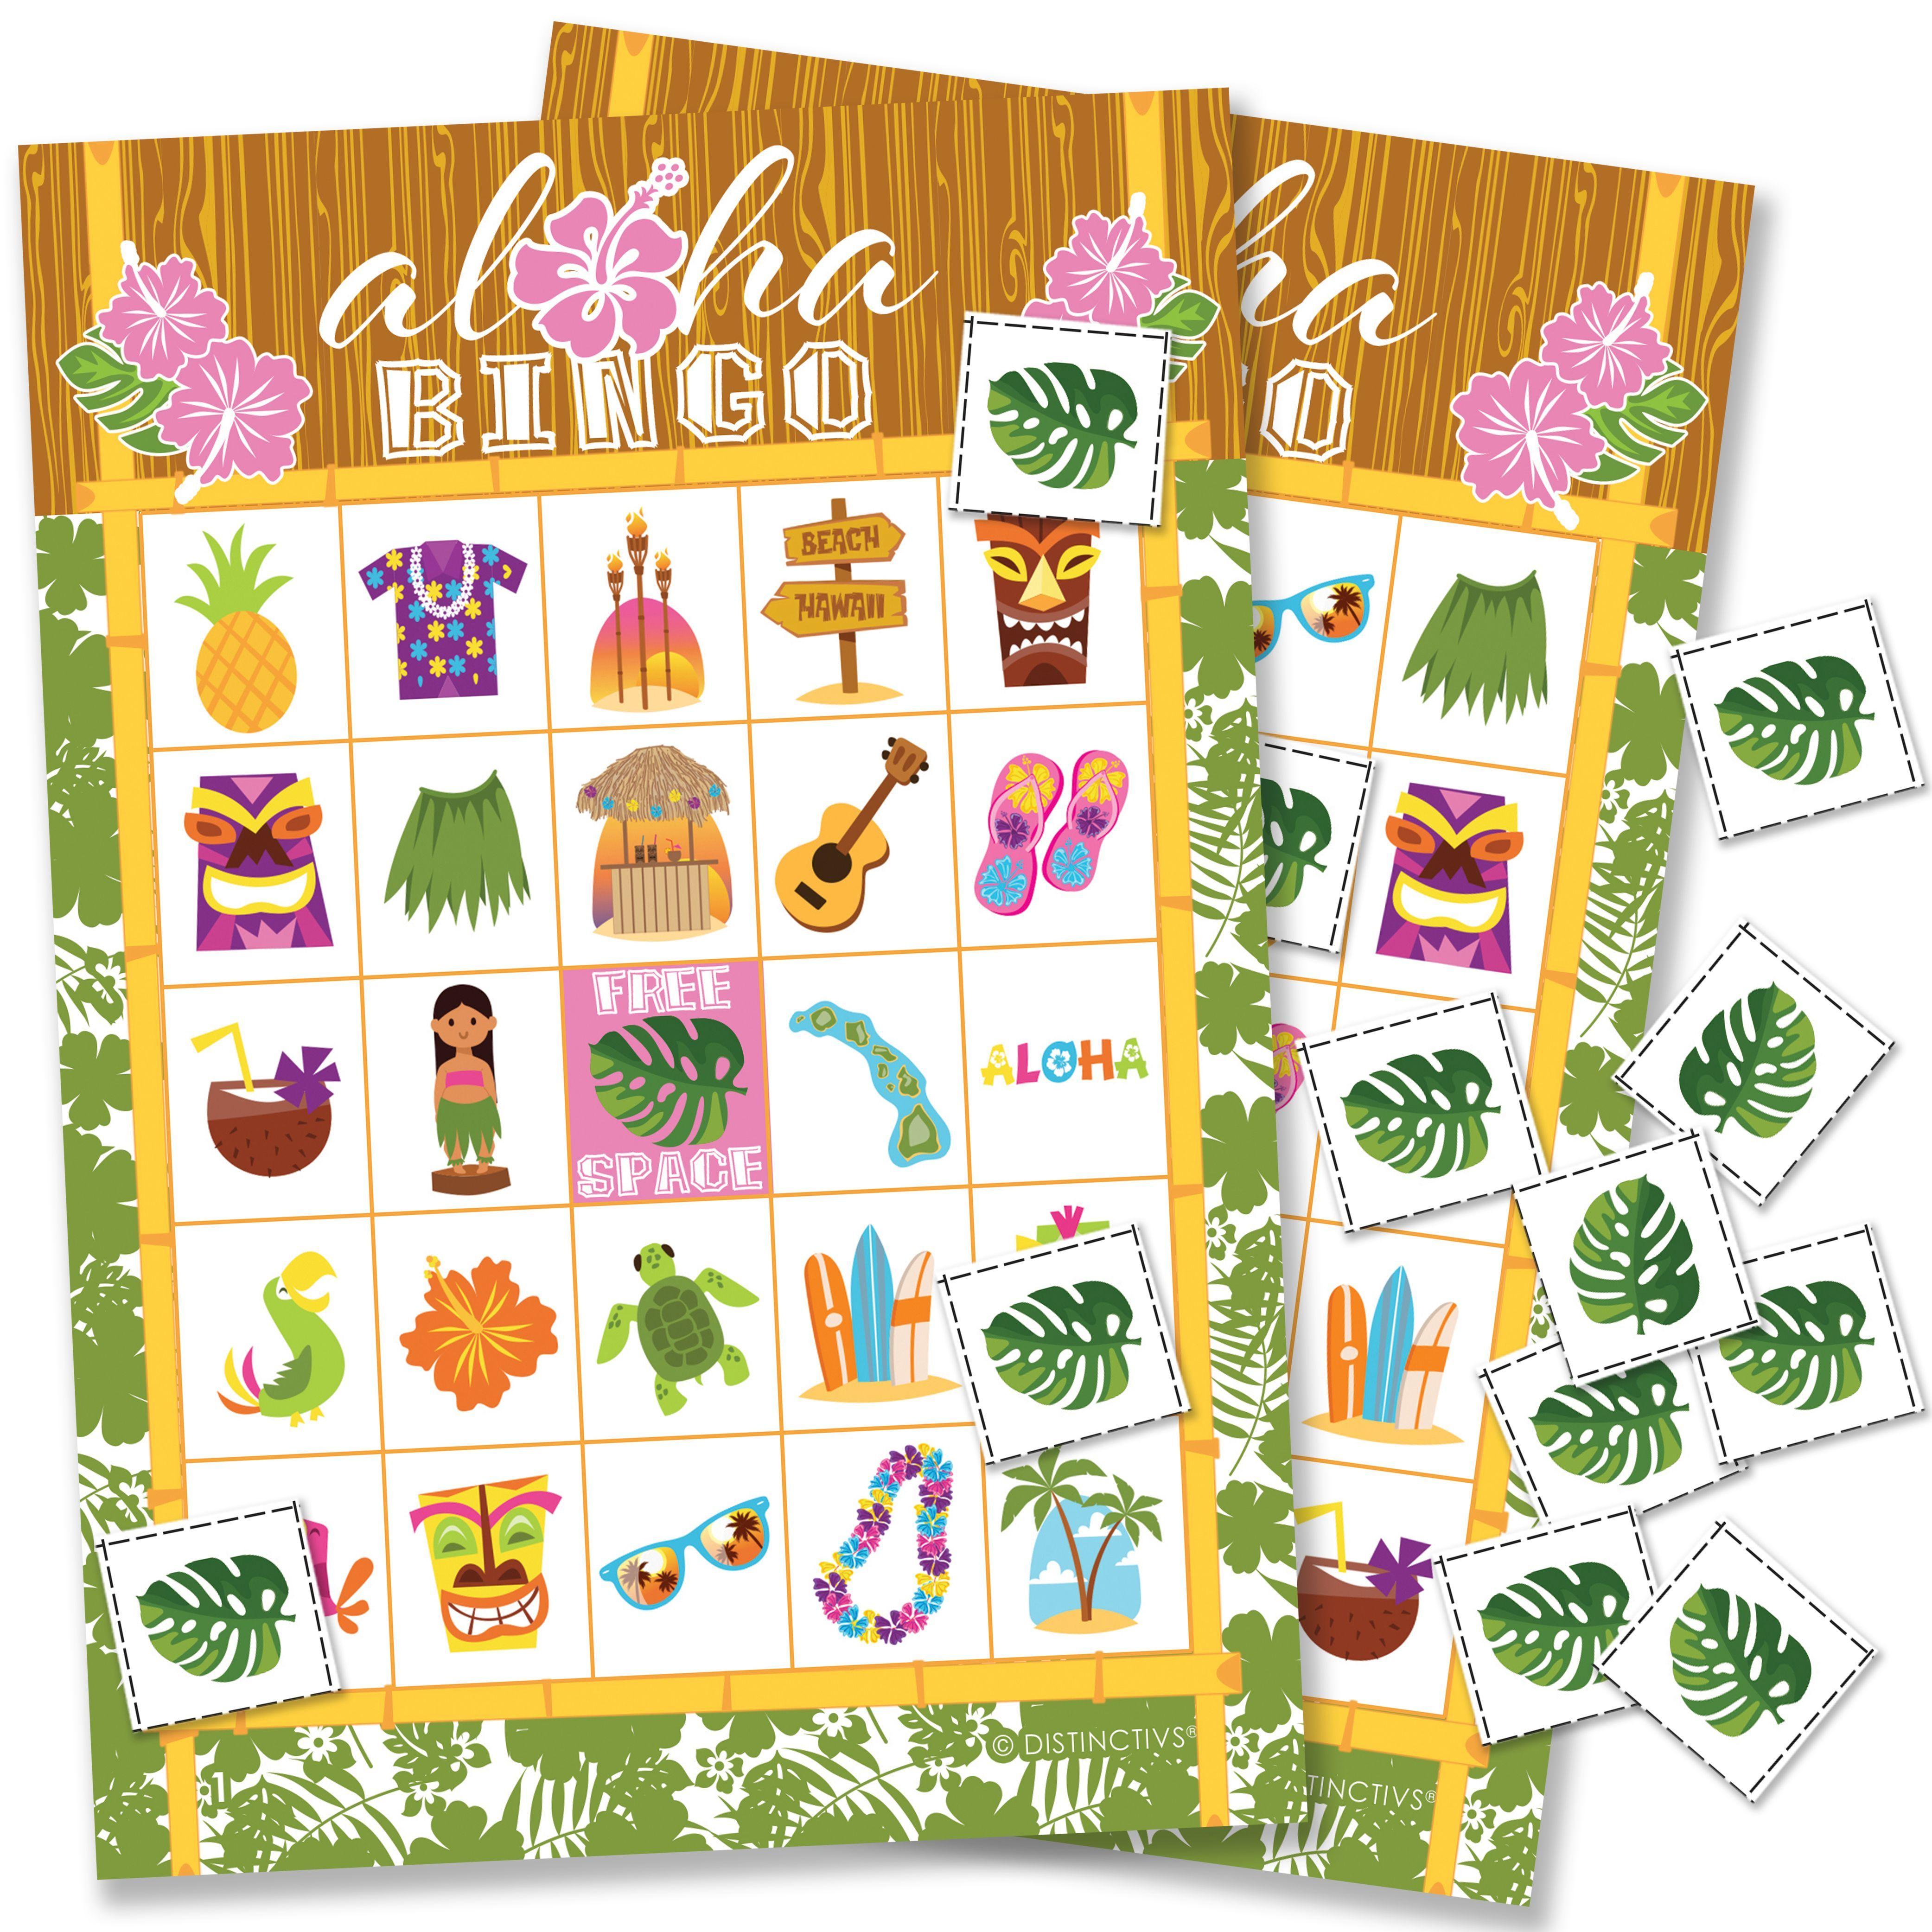 Hawaiian Luau Party Bingo Game 24 Players - Tropical Tiki Luau Birthday Party Supplies - 24 Bingo Cards with Chips - Walmart.com #tropicalbirthdayparty Hawaiian Luau Party Bingo Game 24 Players - Tropical Tiki Luau Birthday Party Supplies - 24 Bingo Cards with Chips - Walmart.com #tropicalbirthdayparty